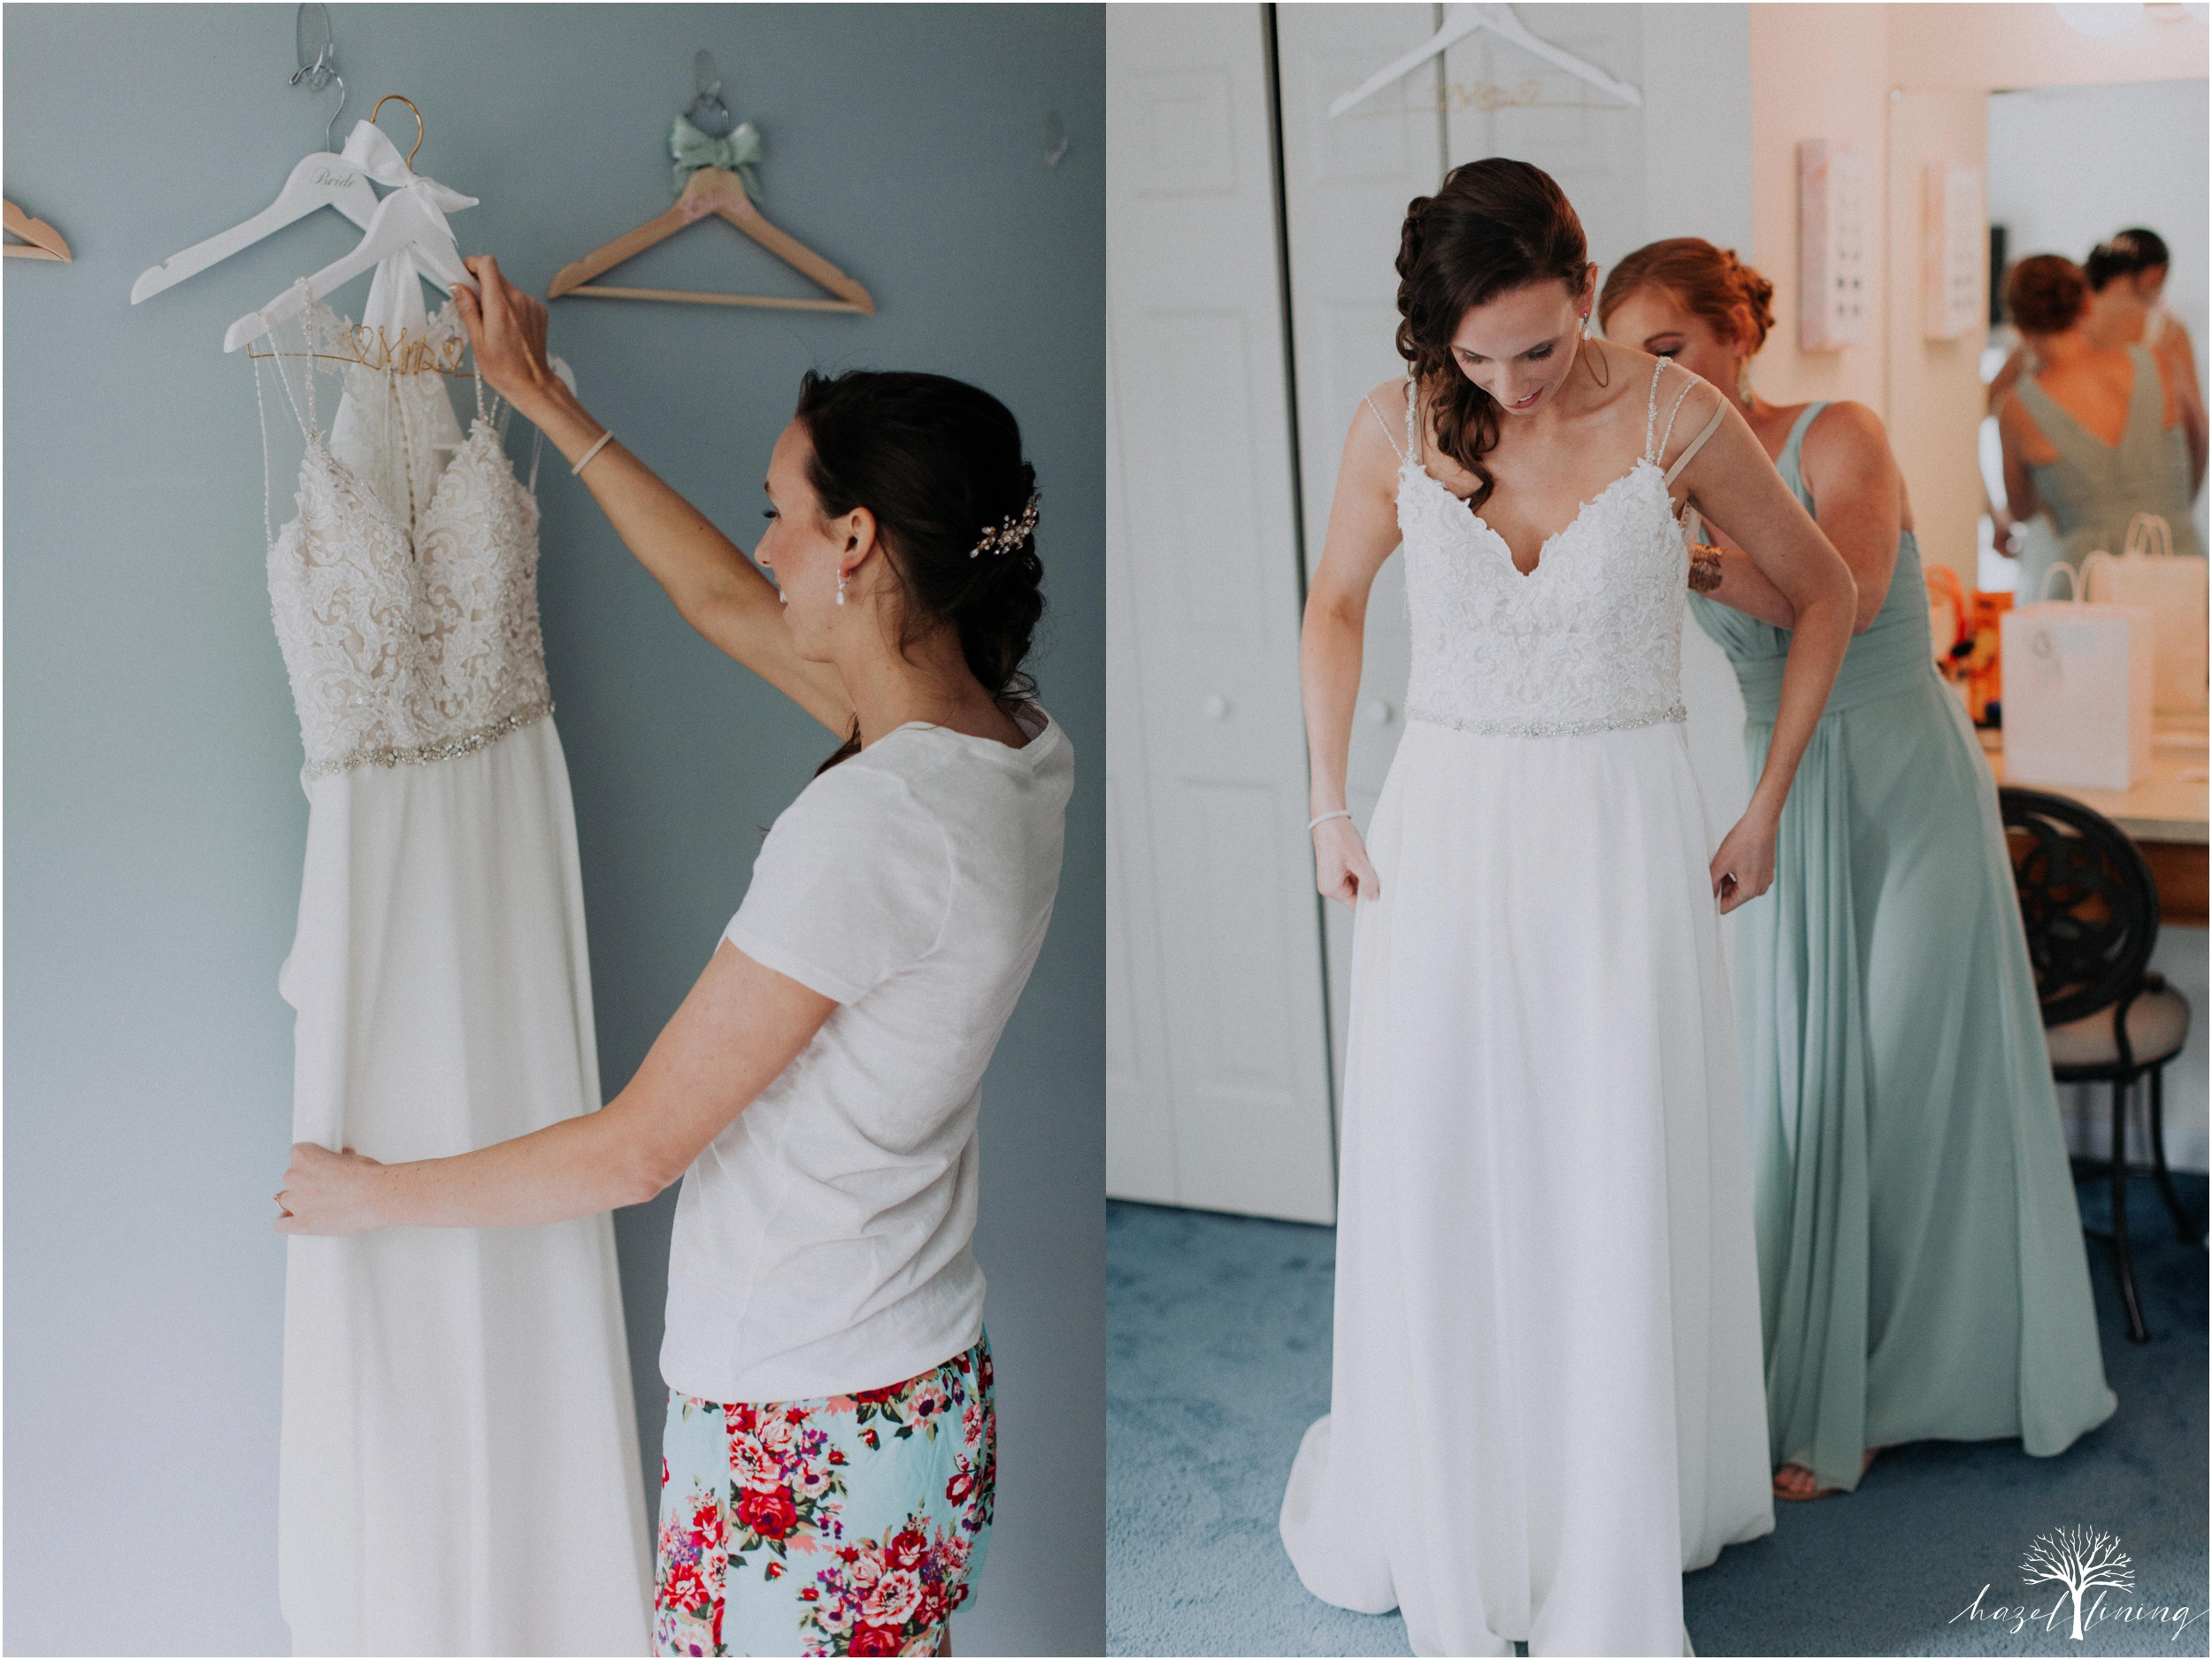 hazel-lining-travel-wedding-elopement-photography_0016.jpg